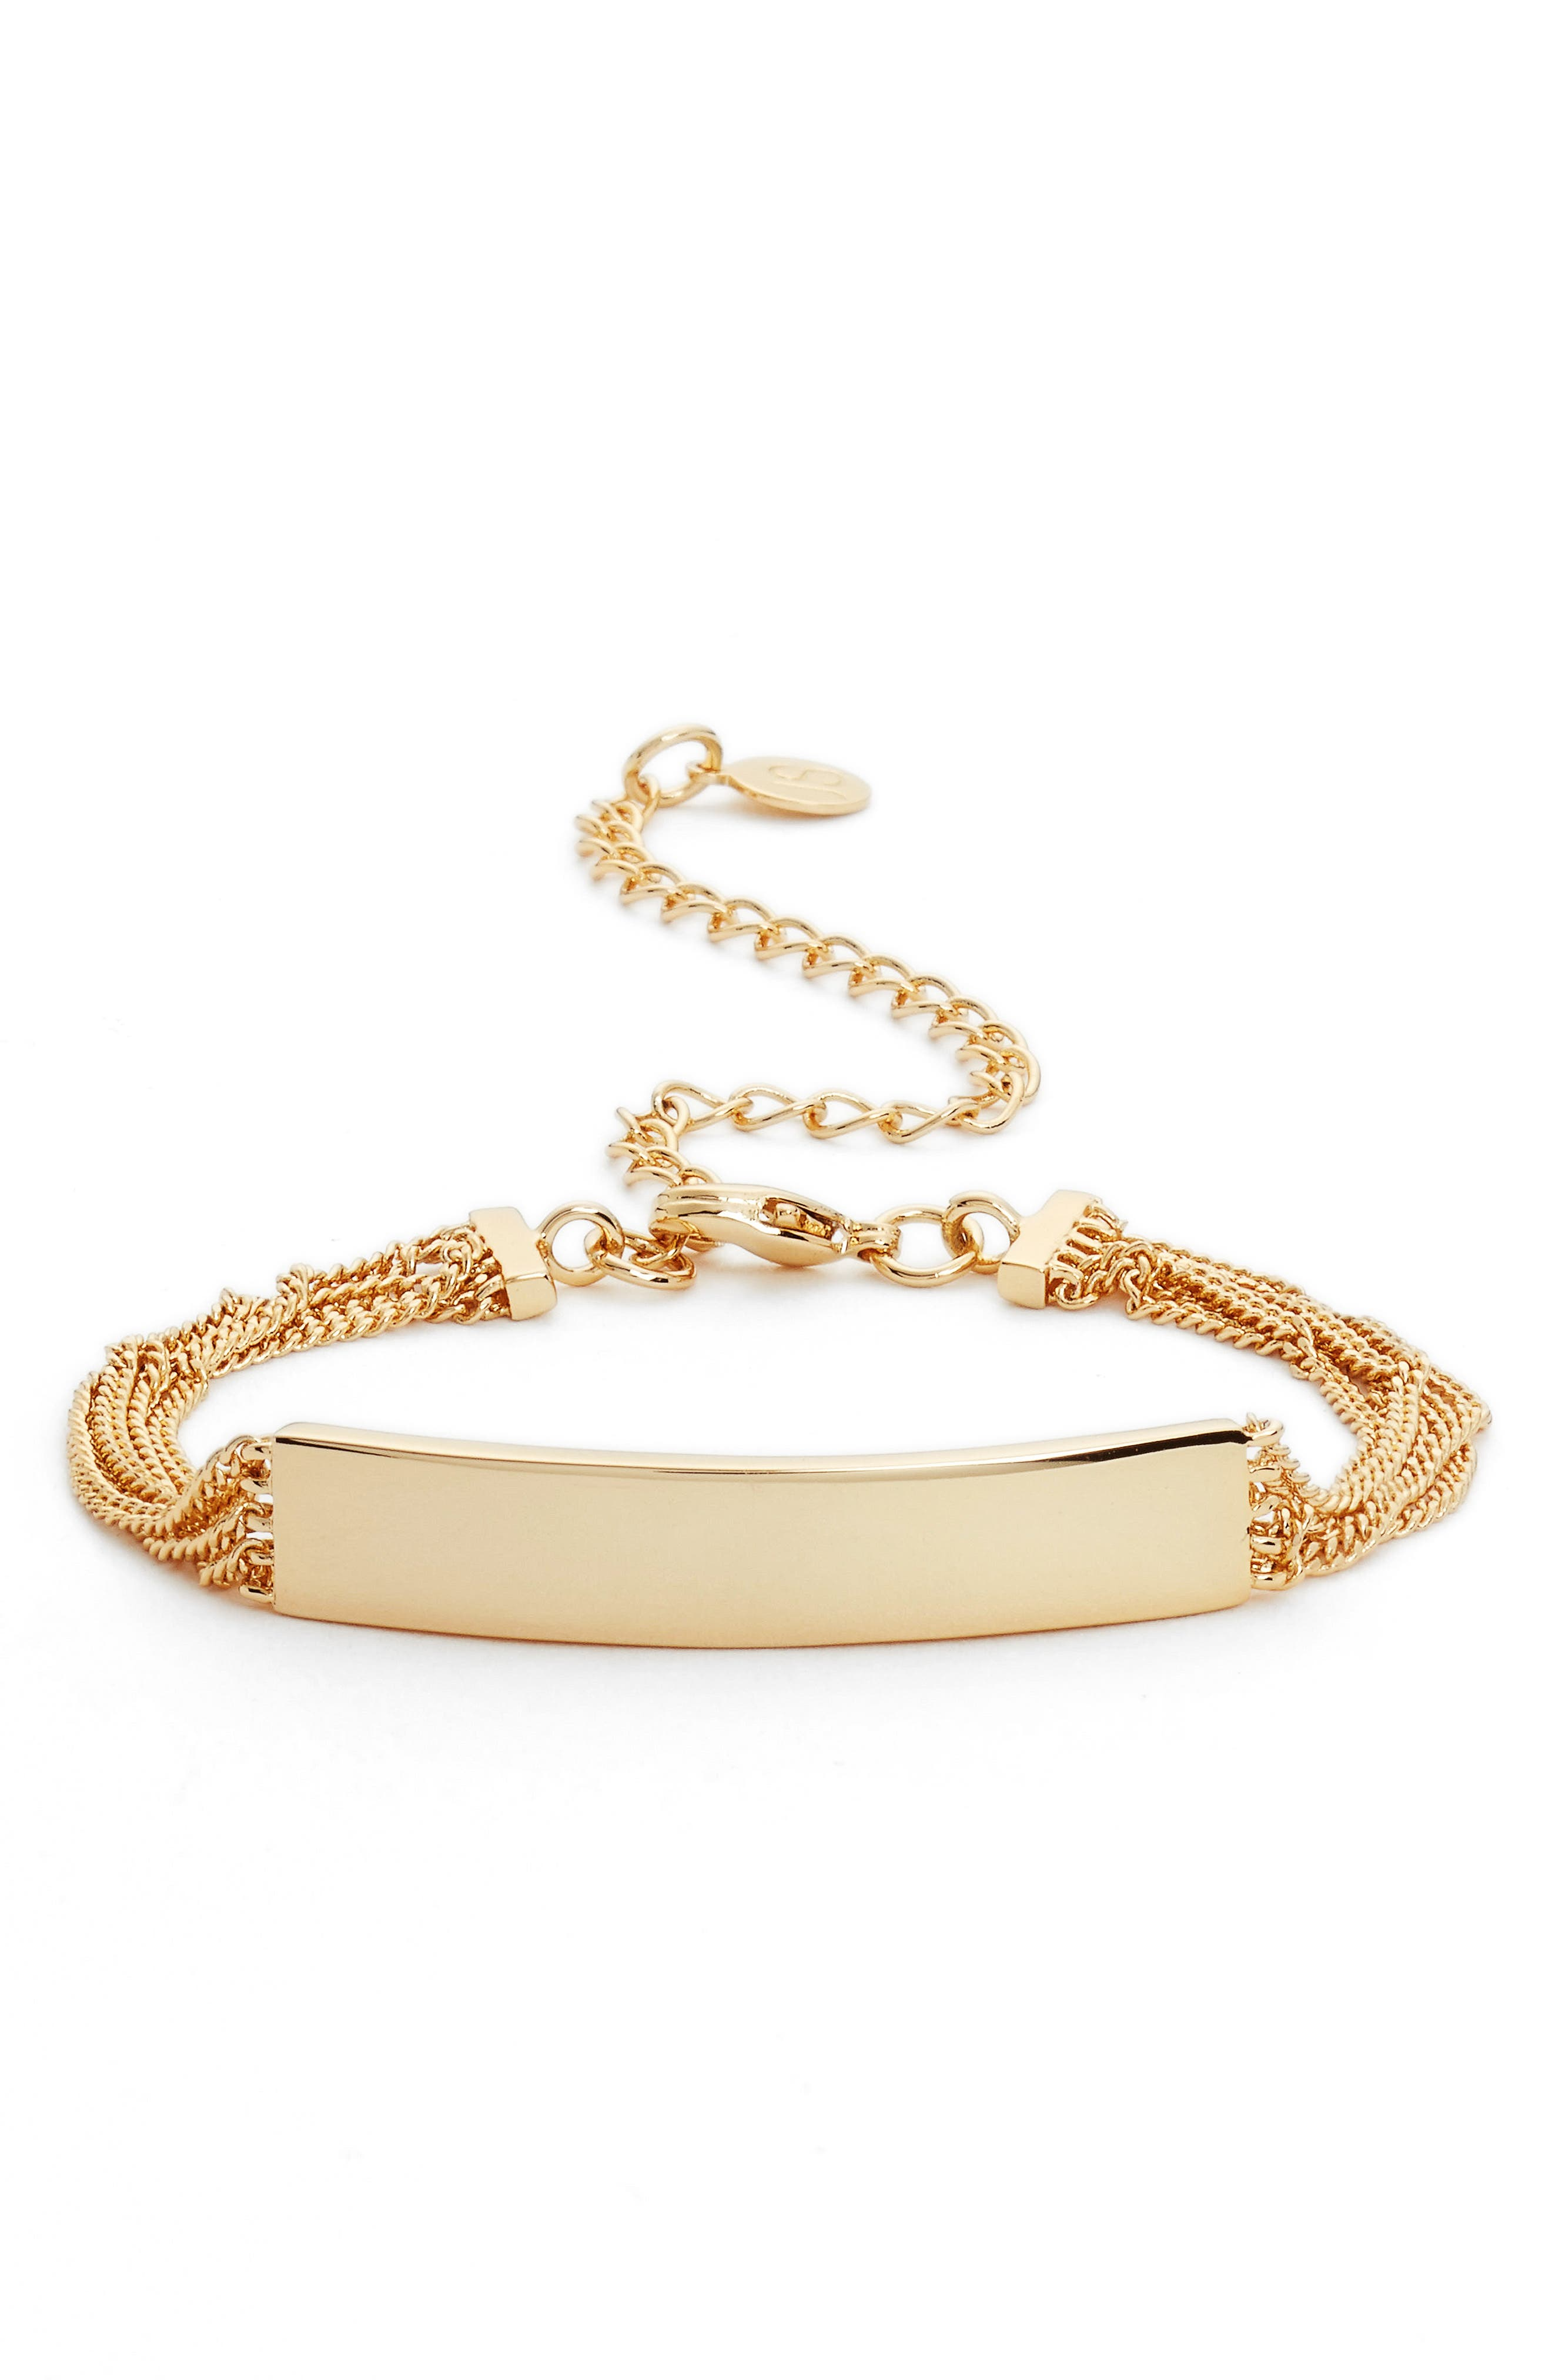 Jules Smith Thera ID Bracelet